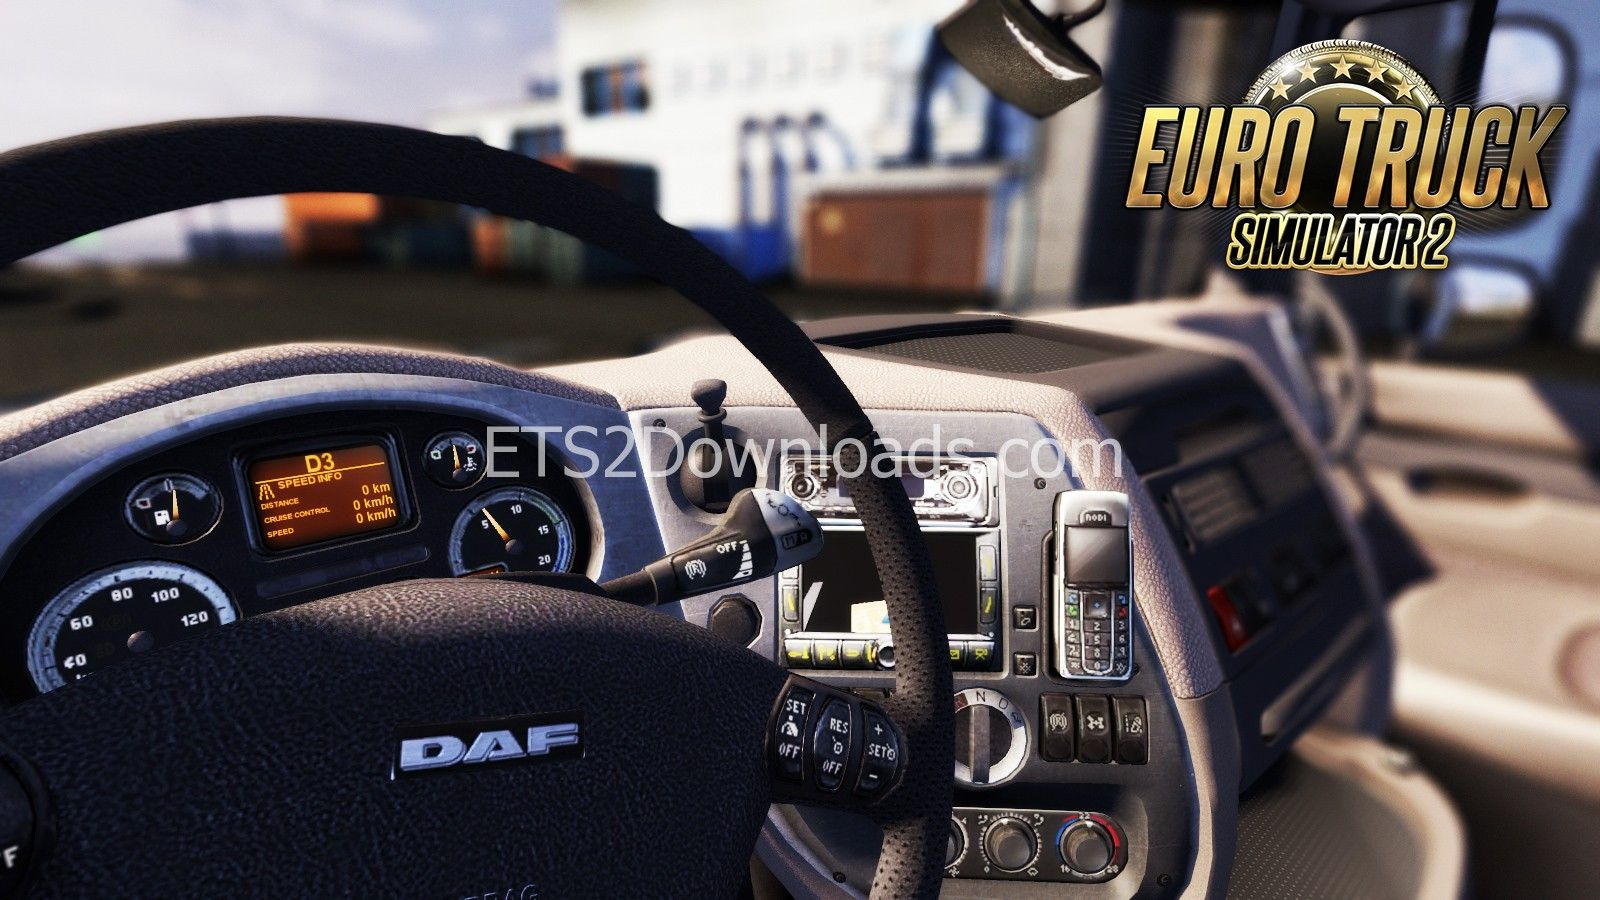 euro truck simulator 2 download for free euro truck simulator 2